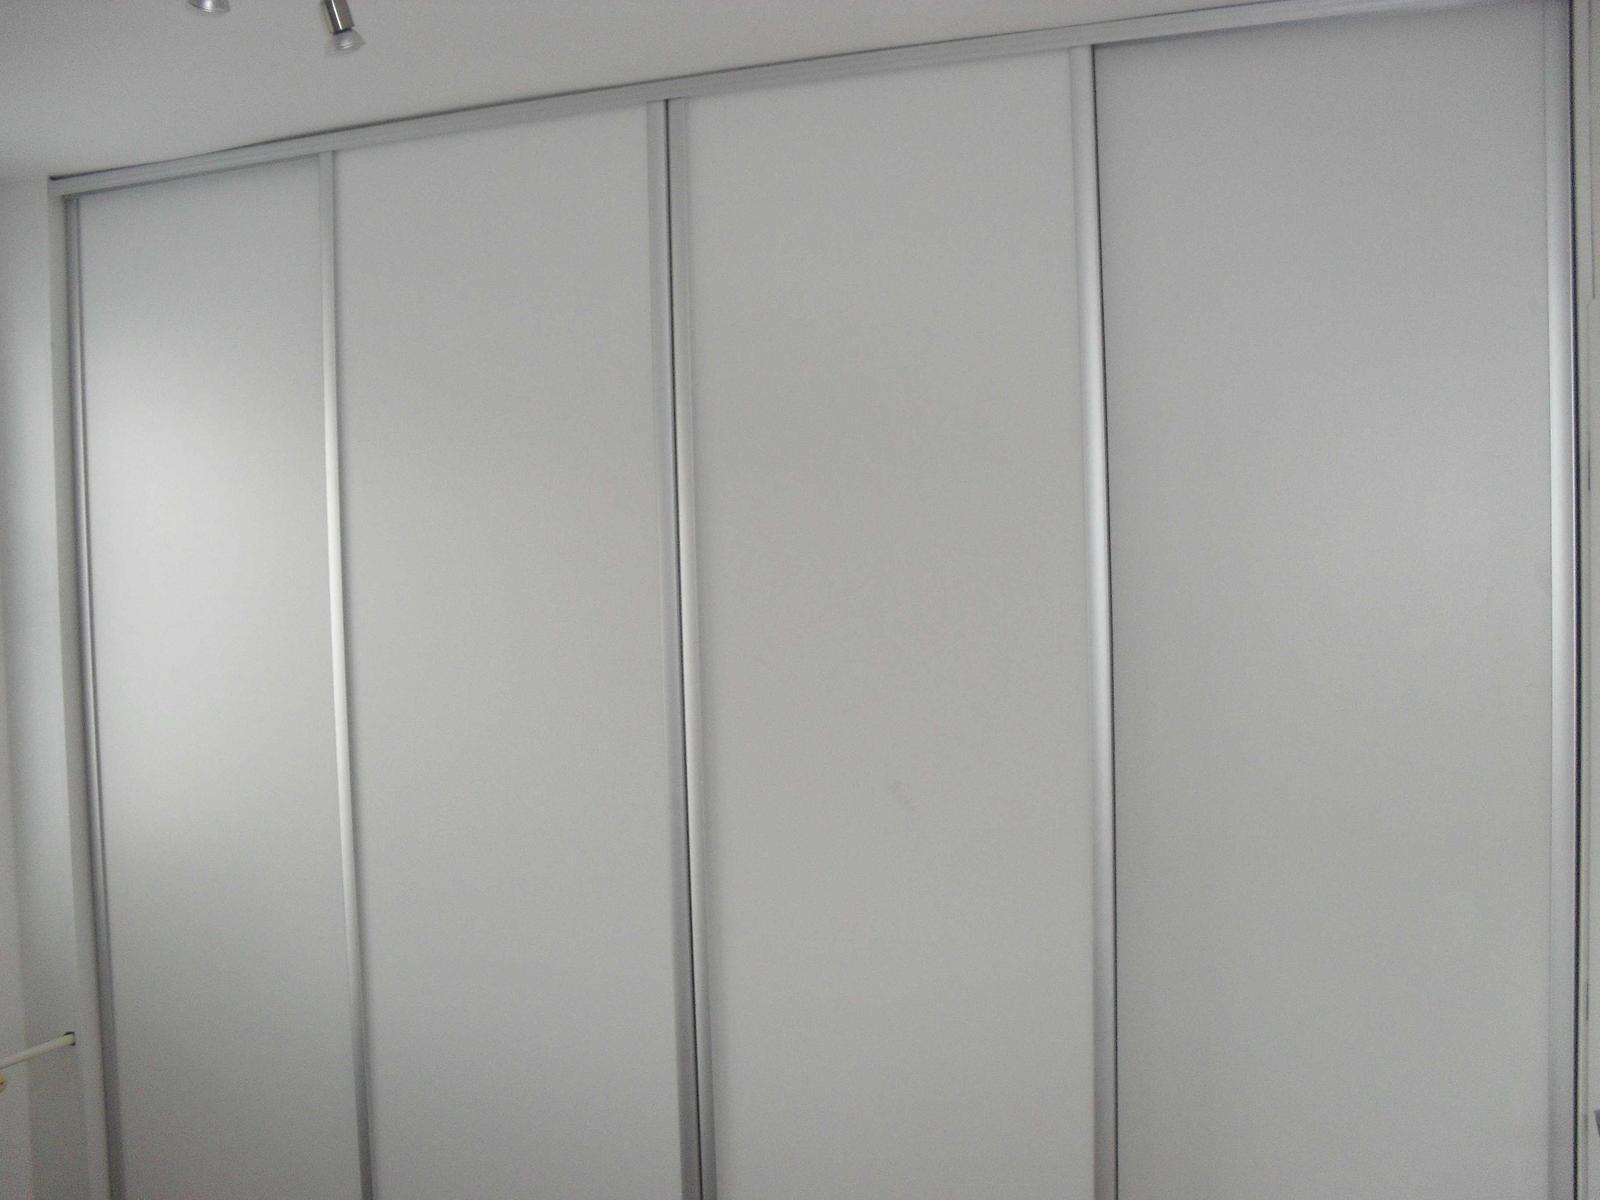 Vstavané skrine Martin Benko Bošany - Obrázok č. 21